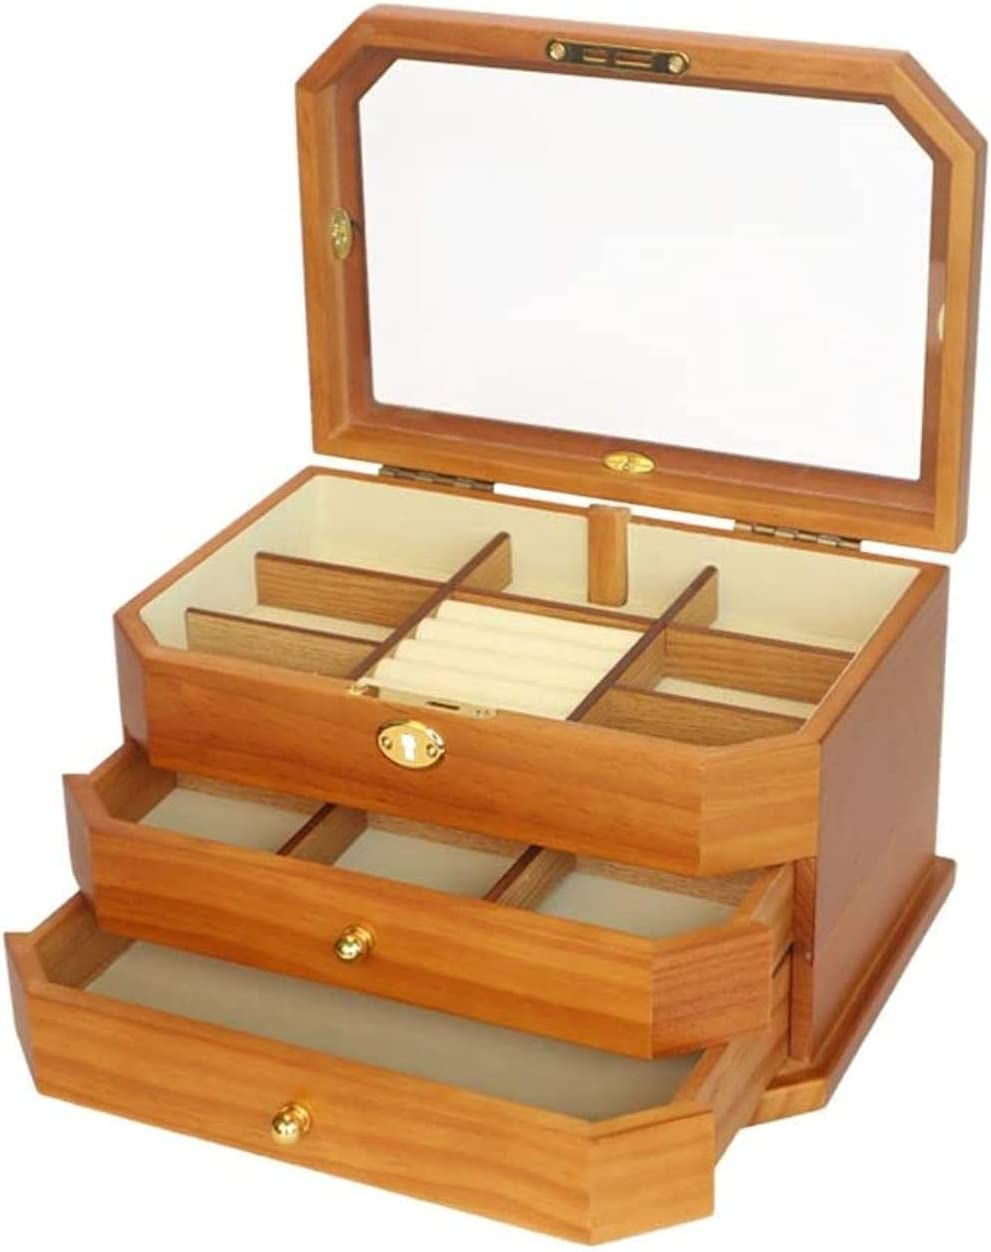 XKun famous Organizer Jewelry Box Max 44% OFF